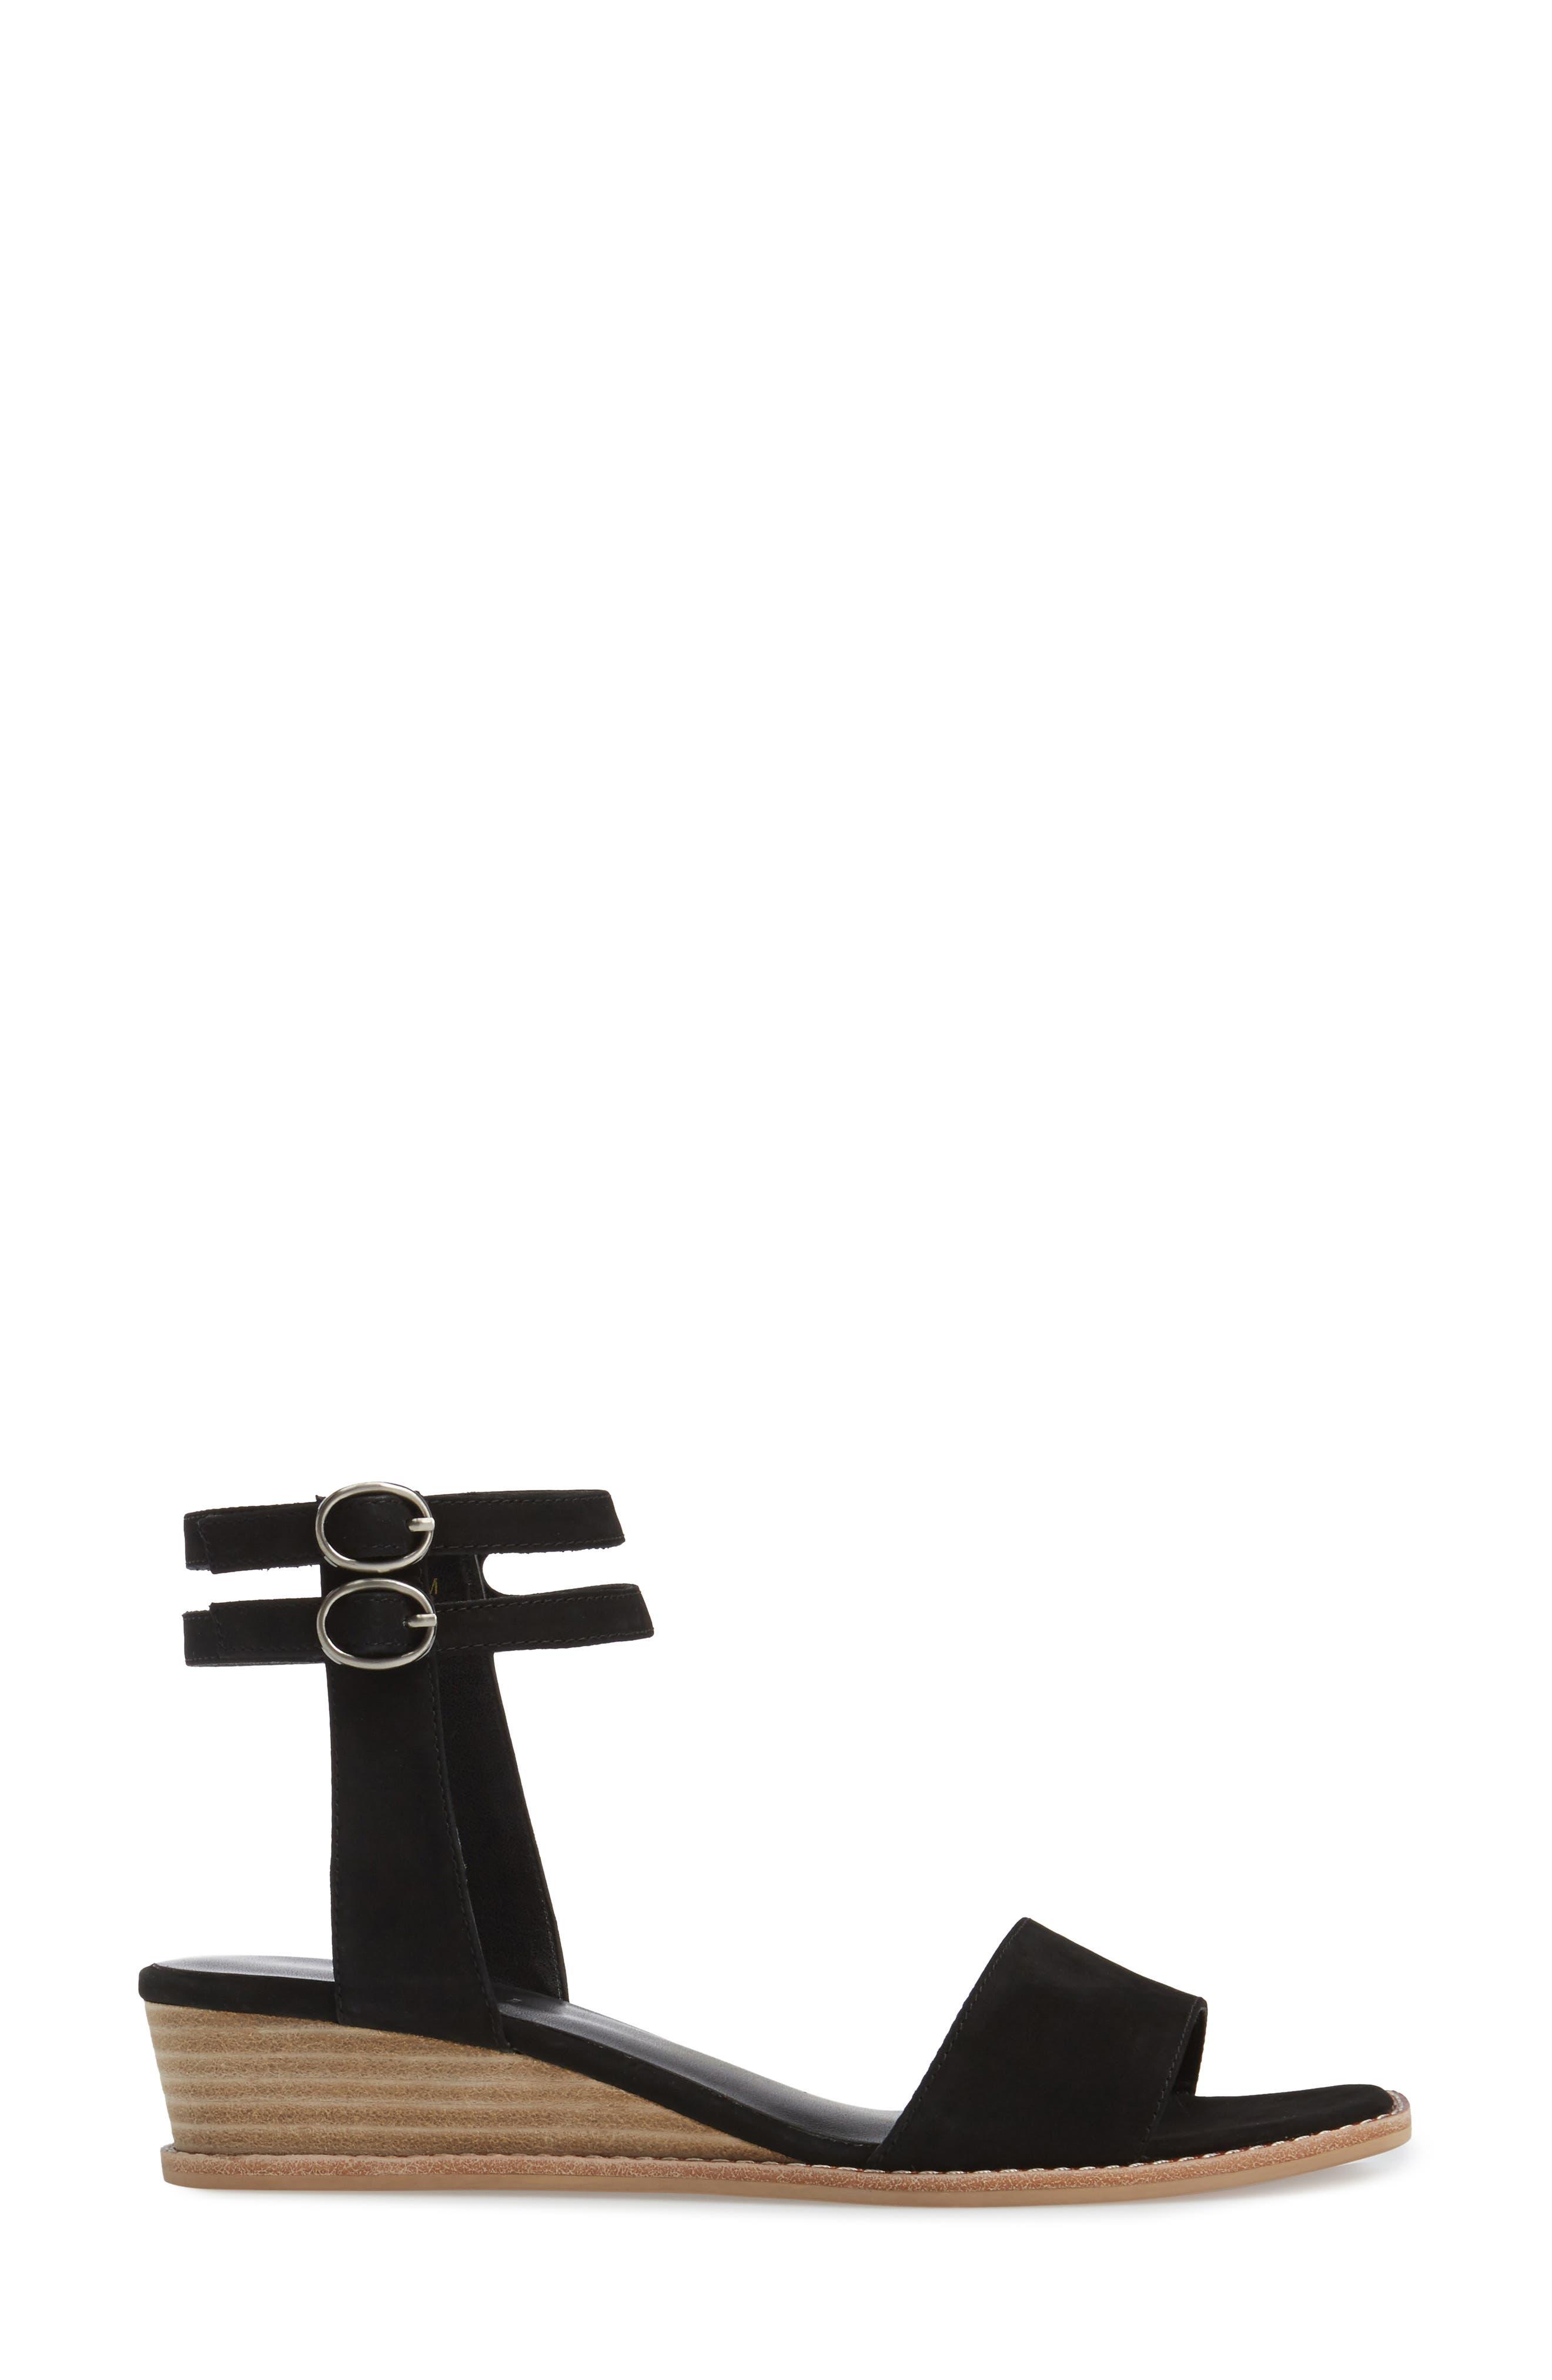 Jarita Ankle Strap Sandal,                             Alternate thumbnail 3, color,                             Black Leather